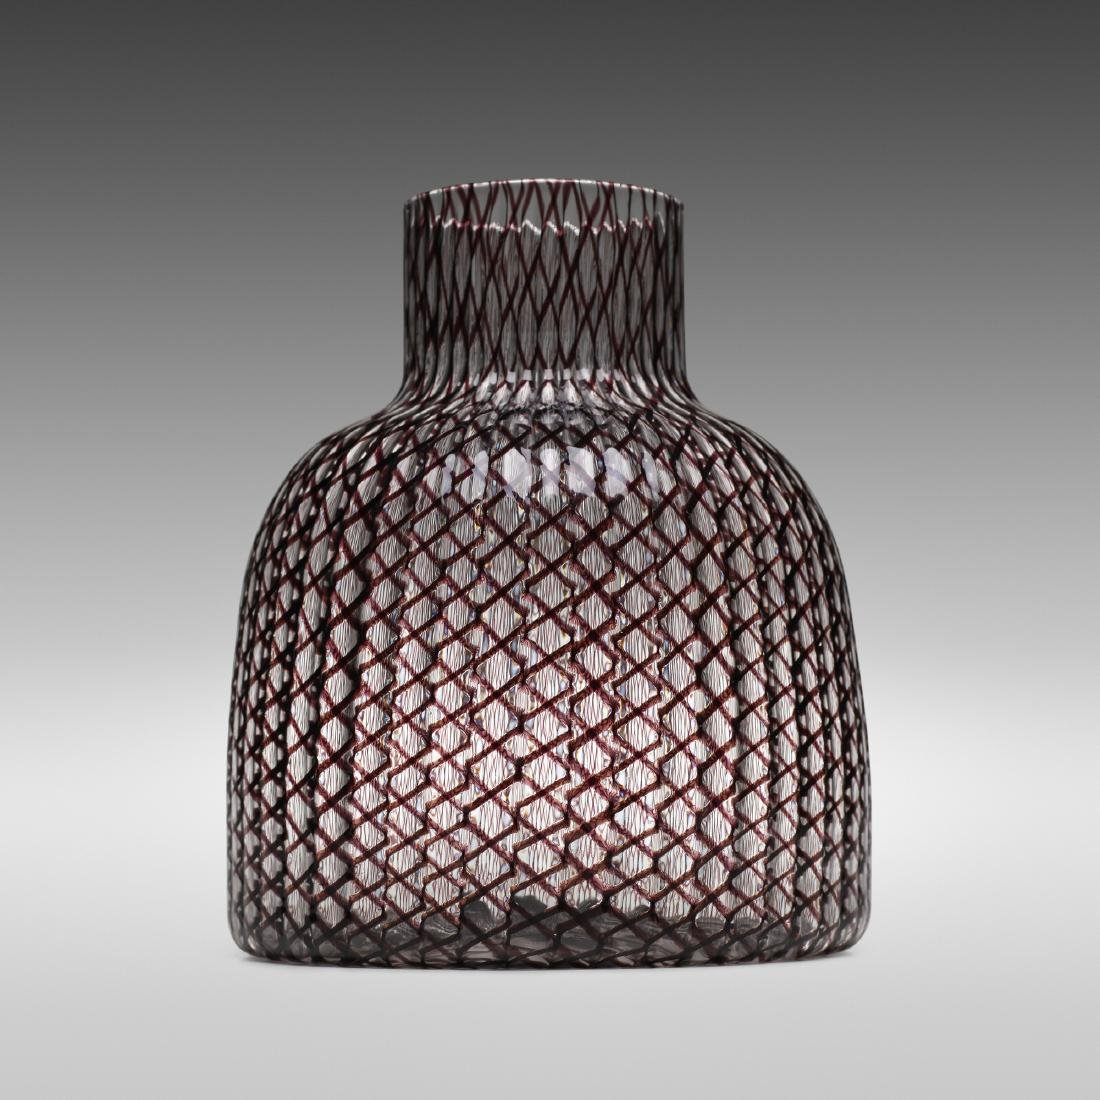 Paolo Venini, Zanfirico vase, model 4701